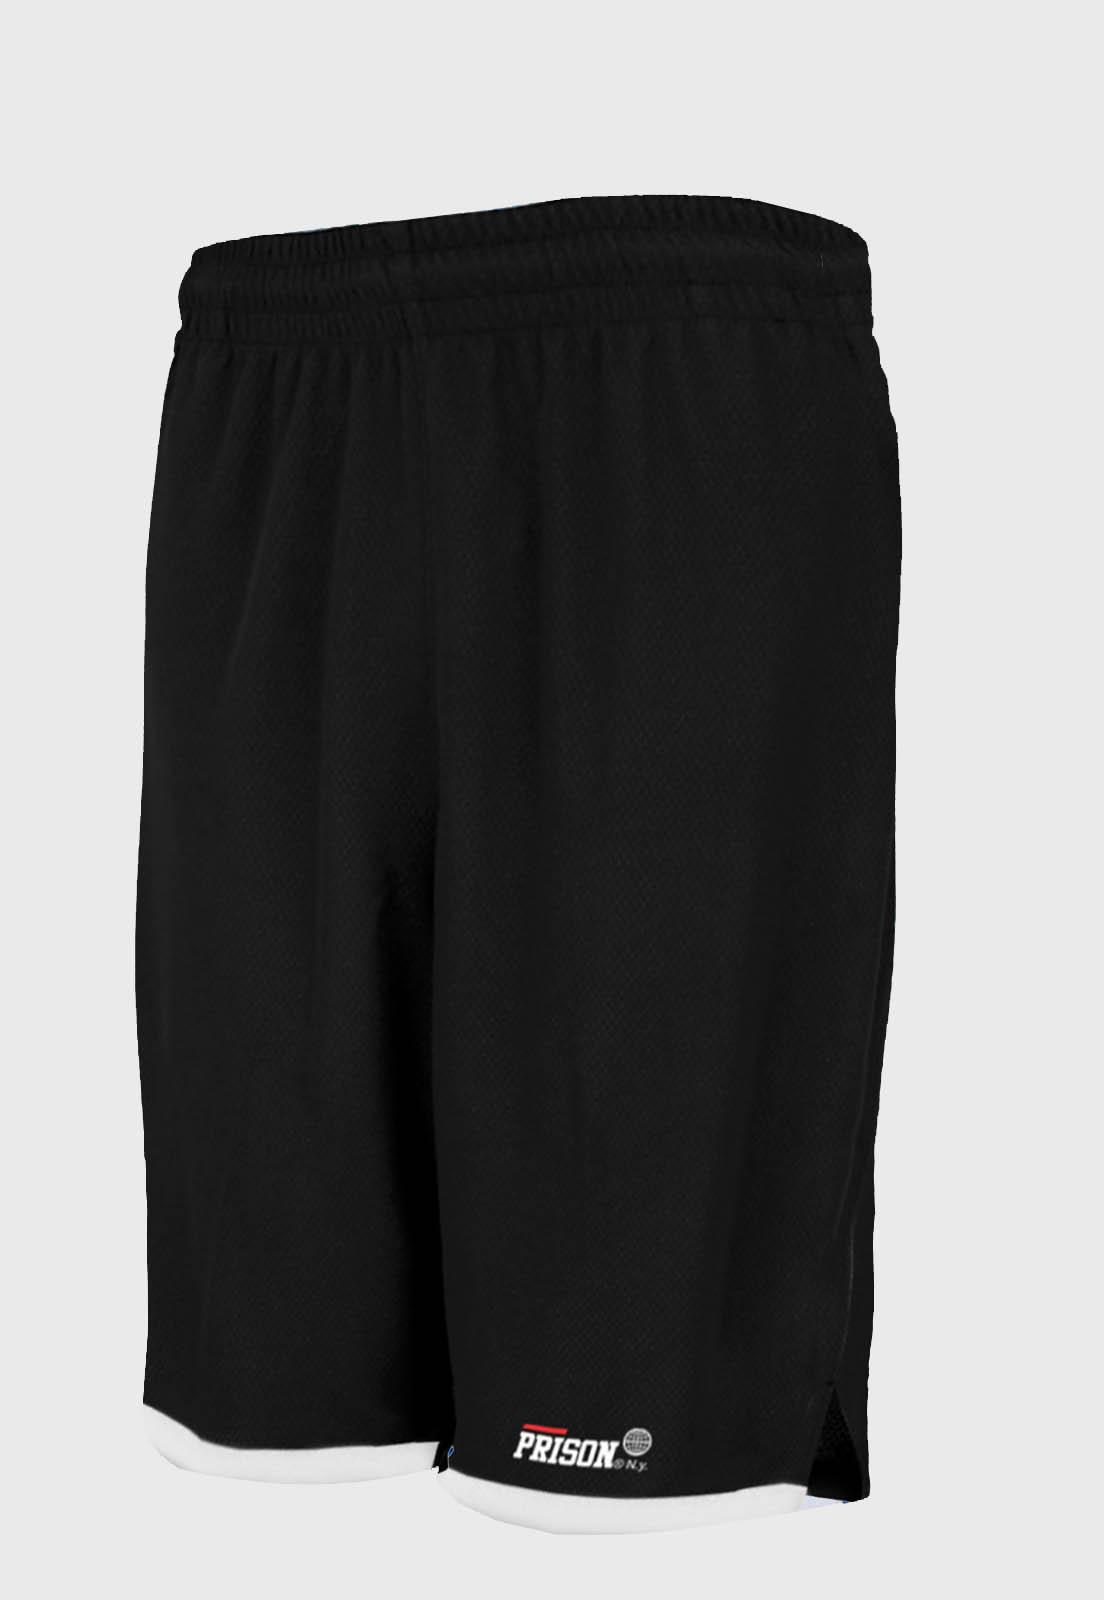 Bermuda Esportiva Prison Streetwear Black